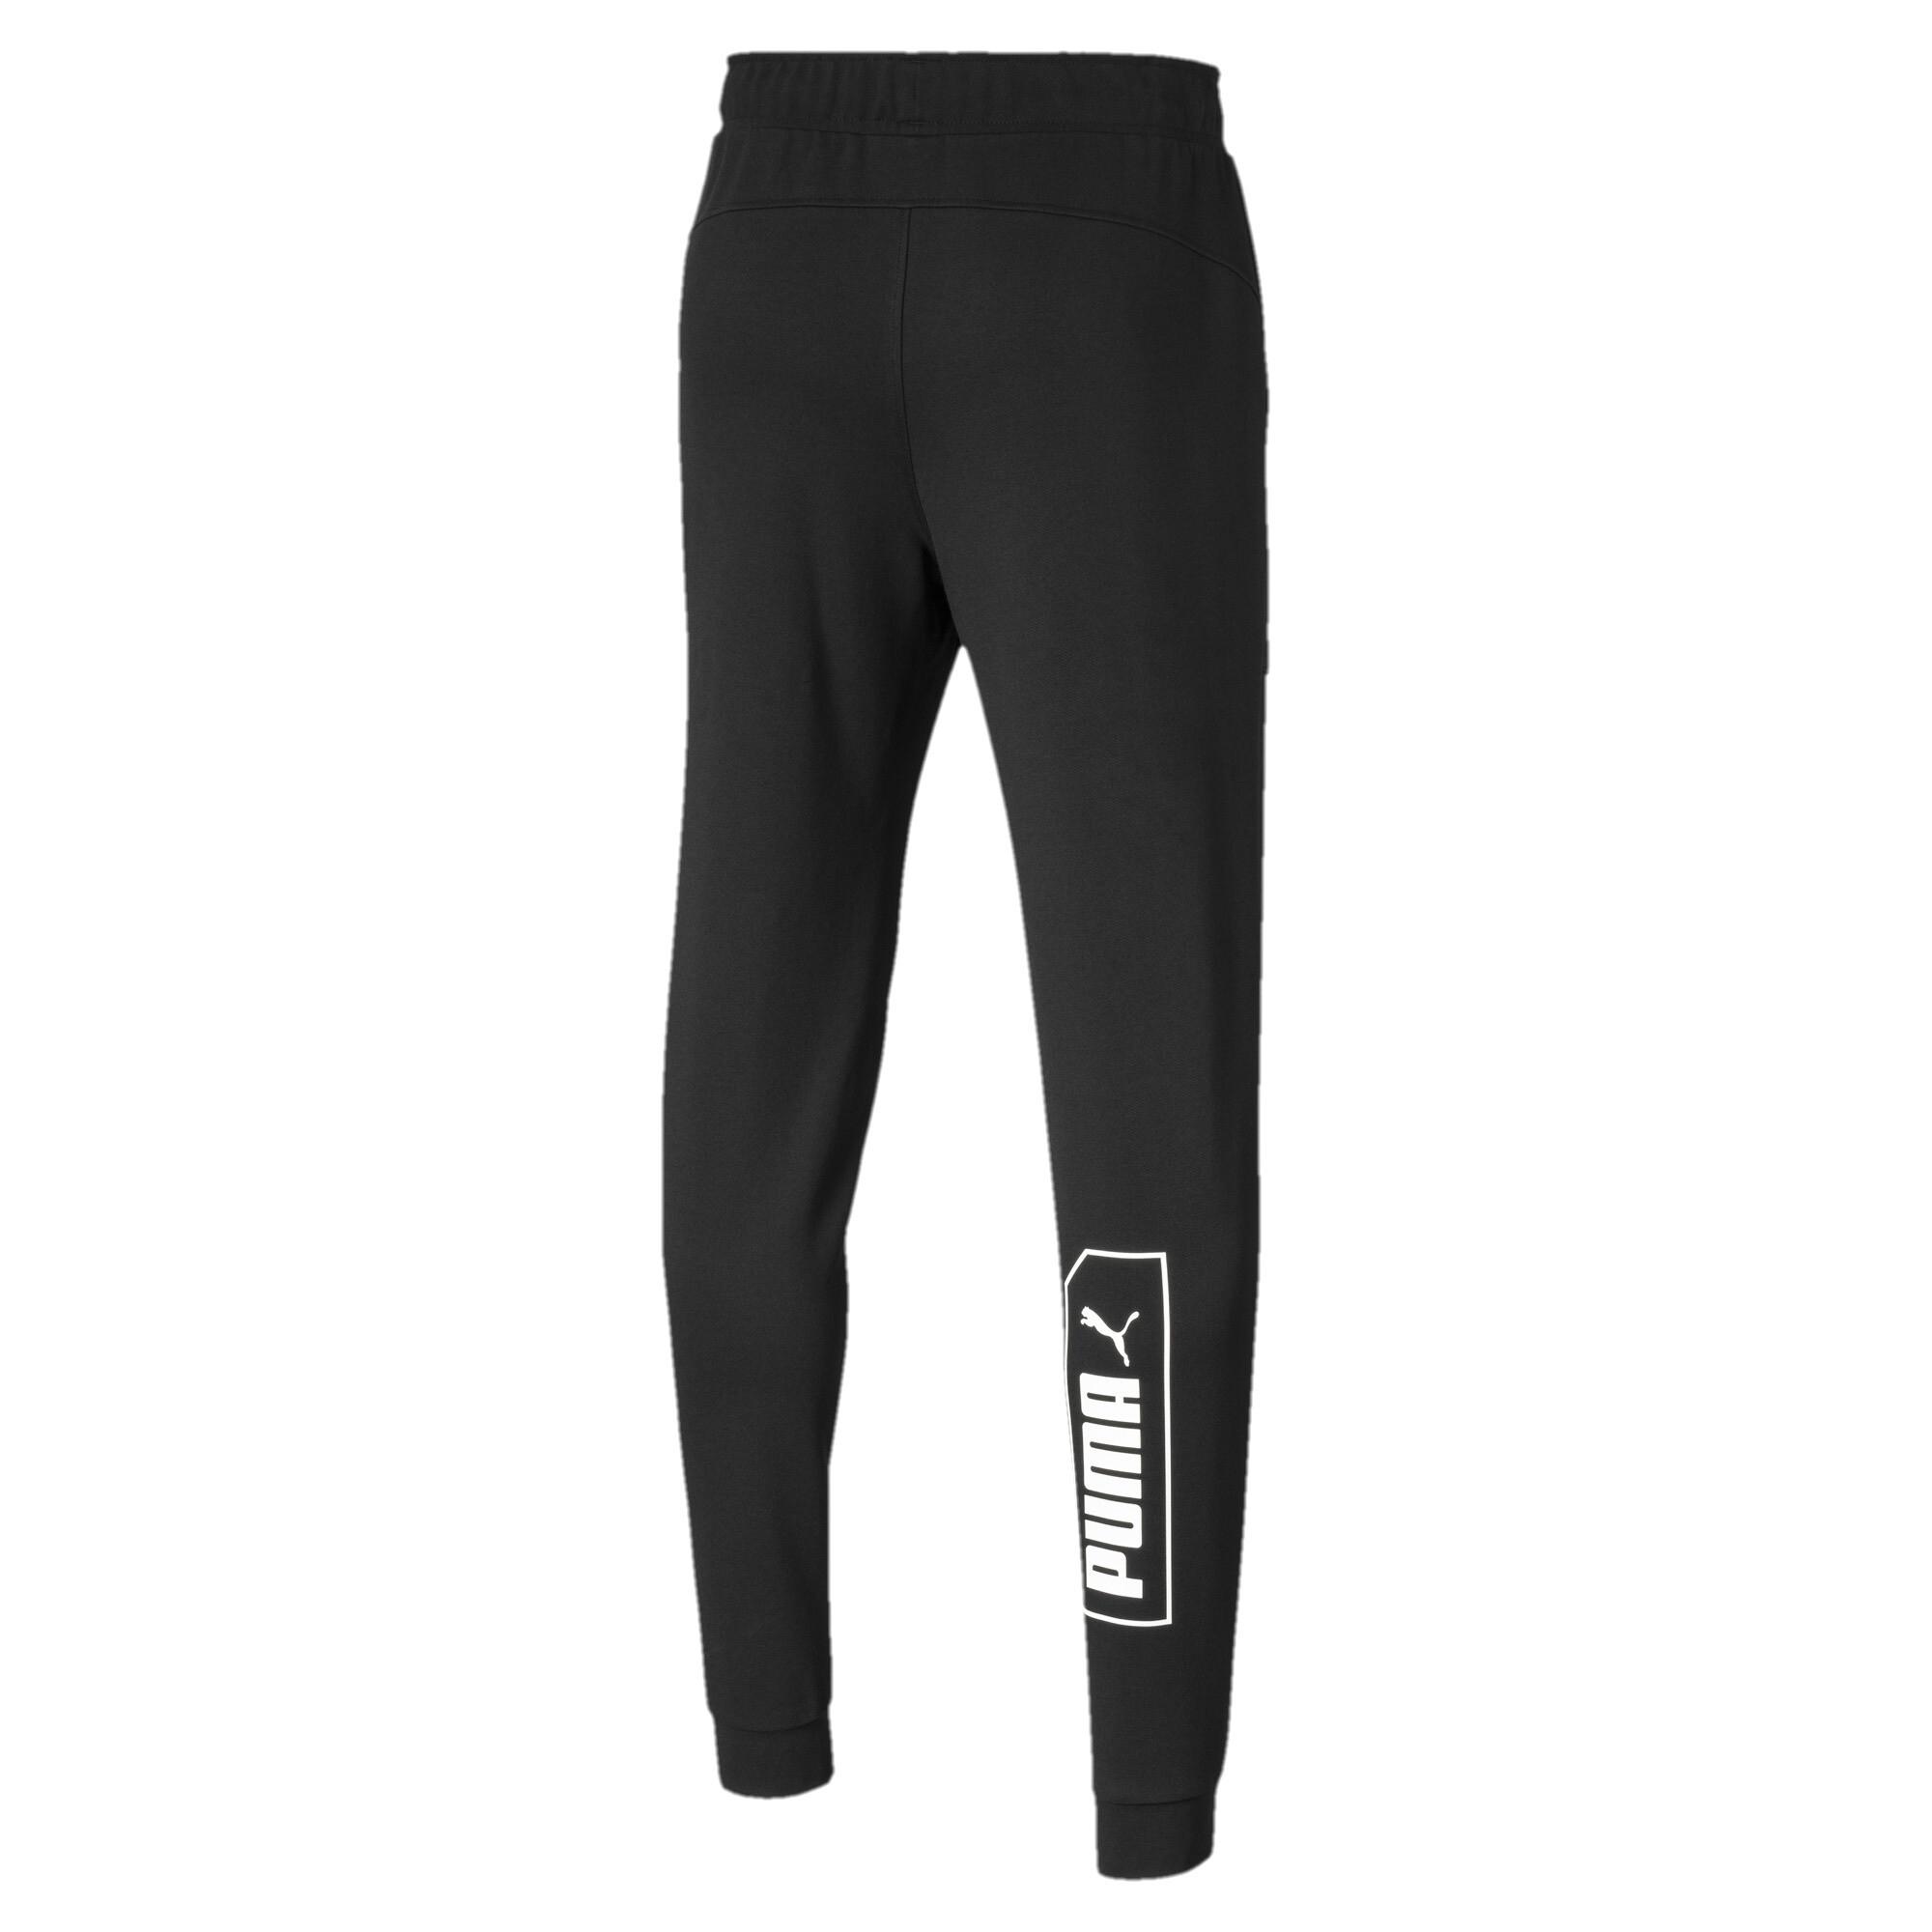 PUMA-NU-TILITY-Men-039-s-Sweatpants-Men-Knitted-Pants-Basics thumbnail 18